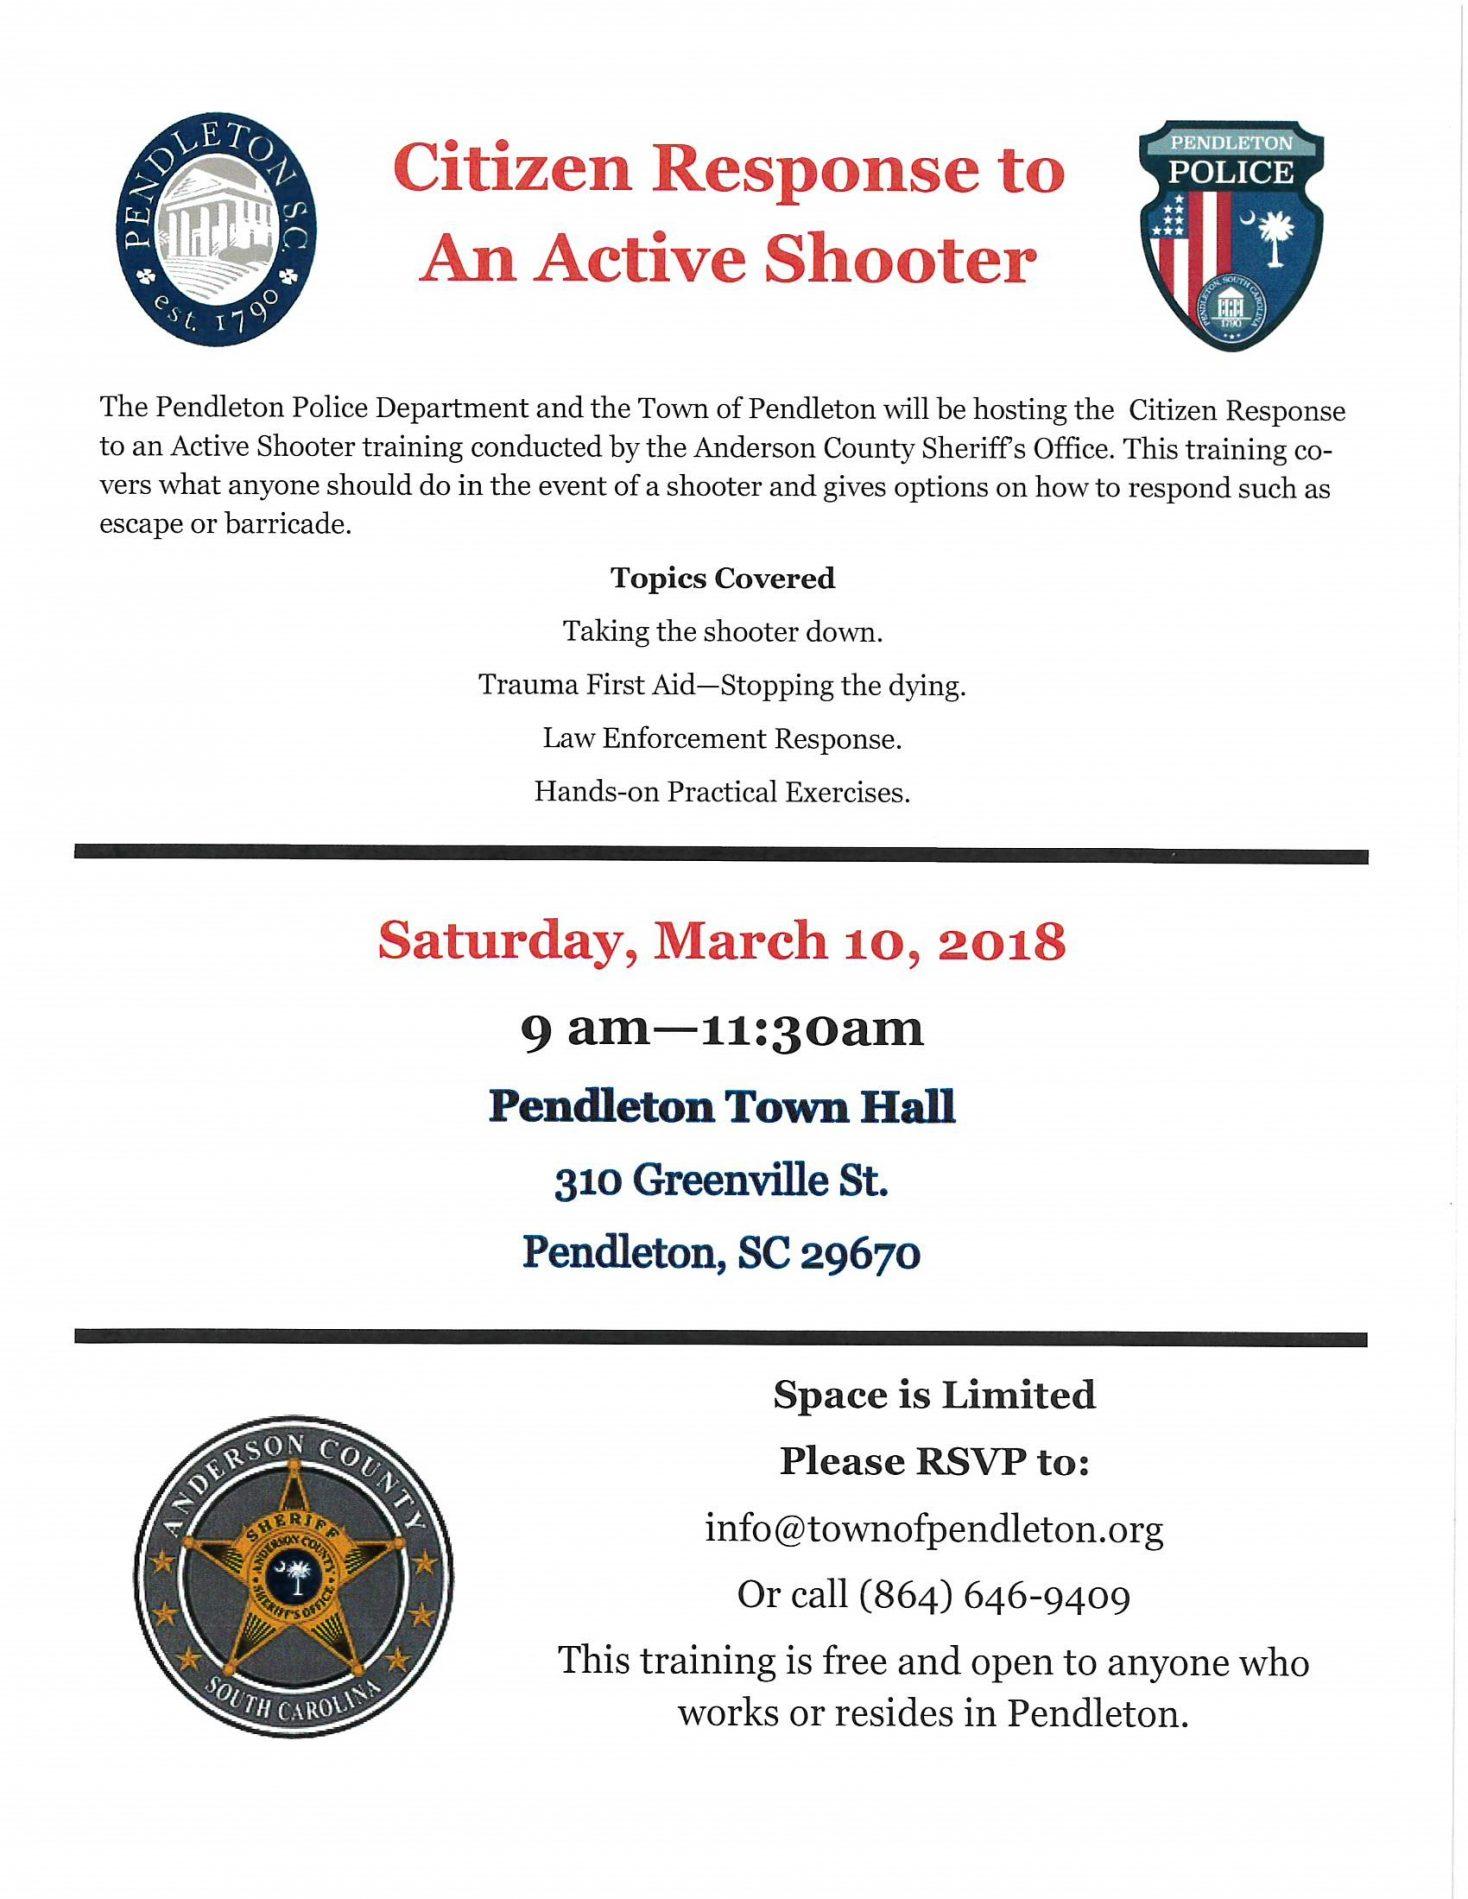 Citizen Response to An Active Shooter Training